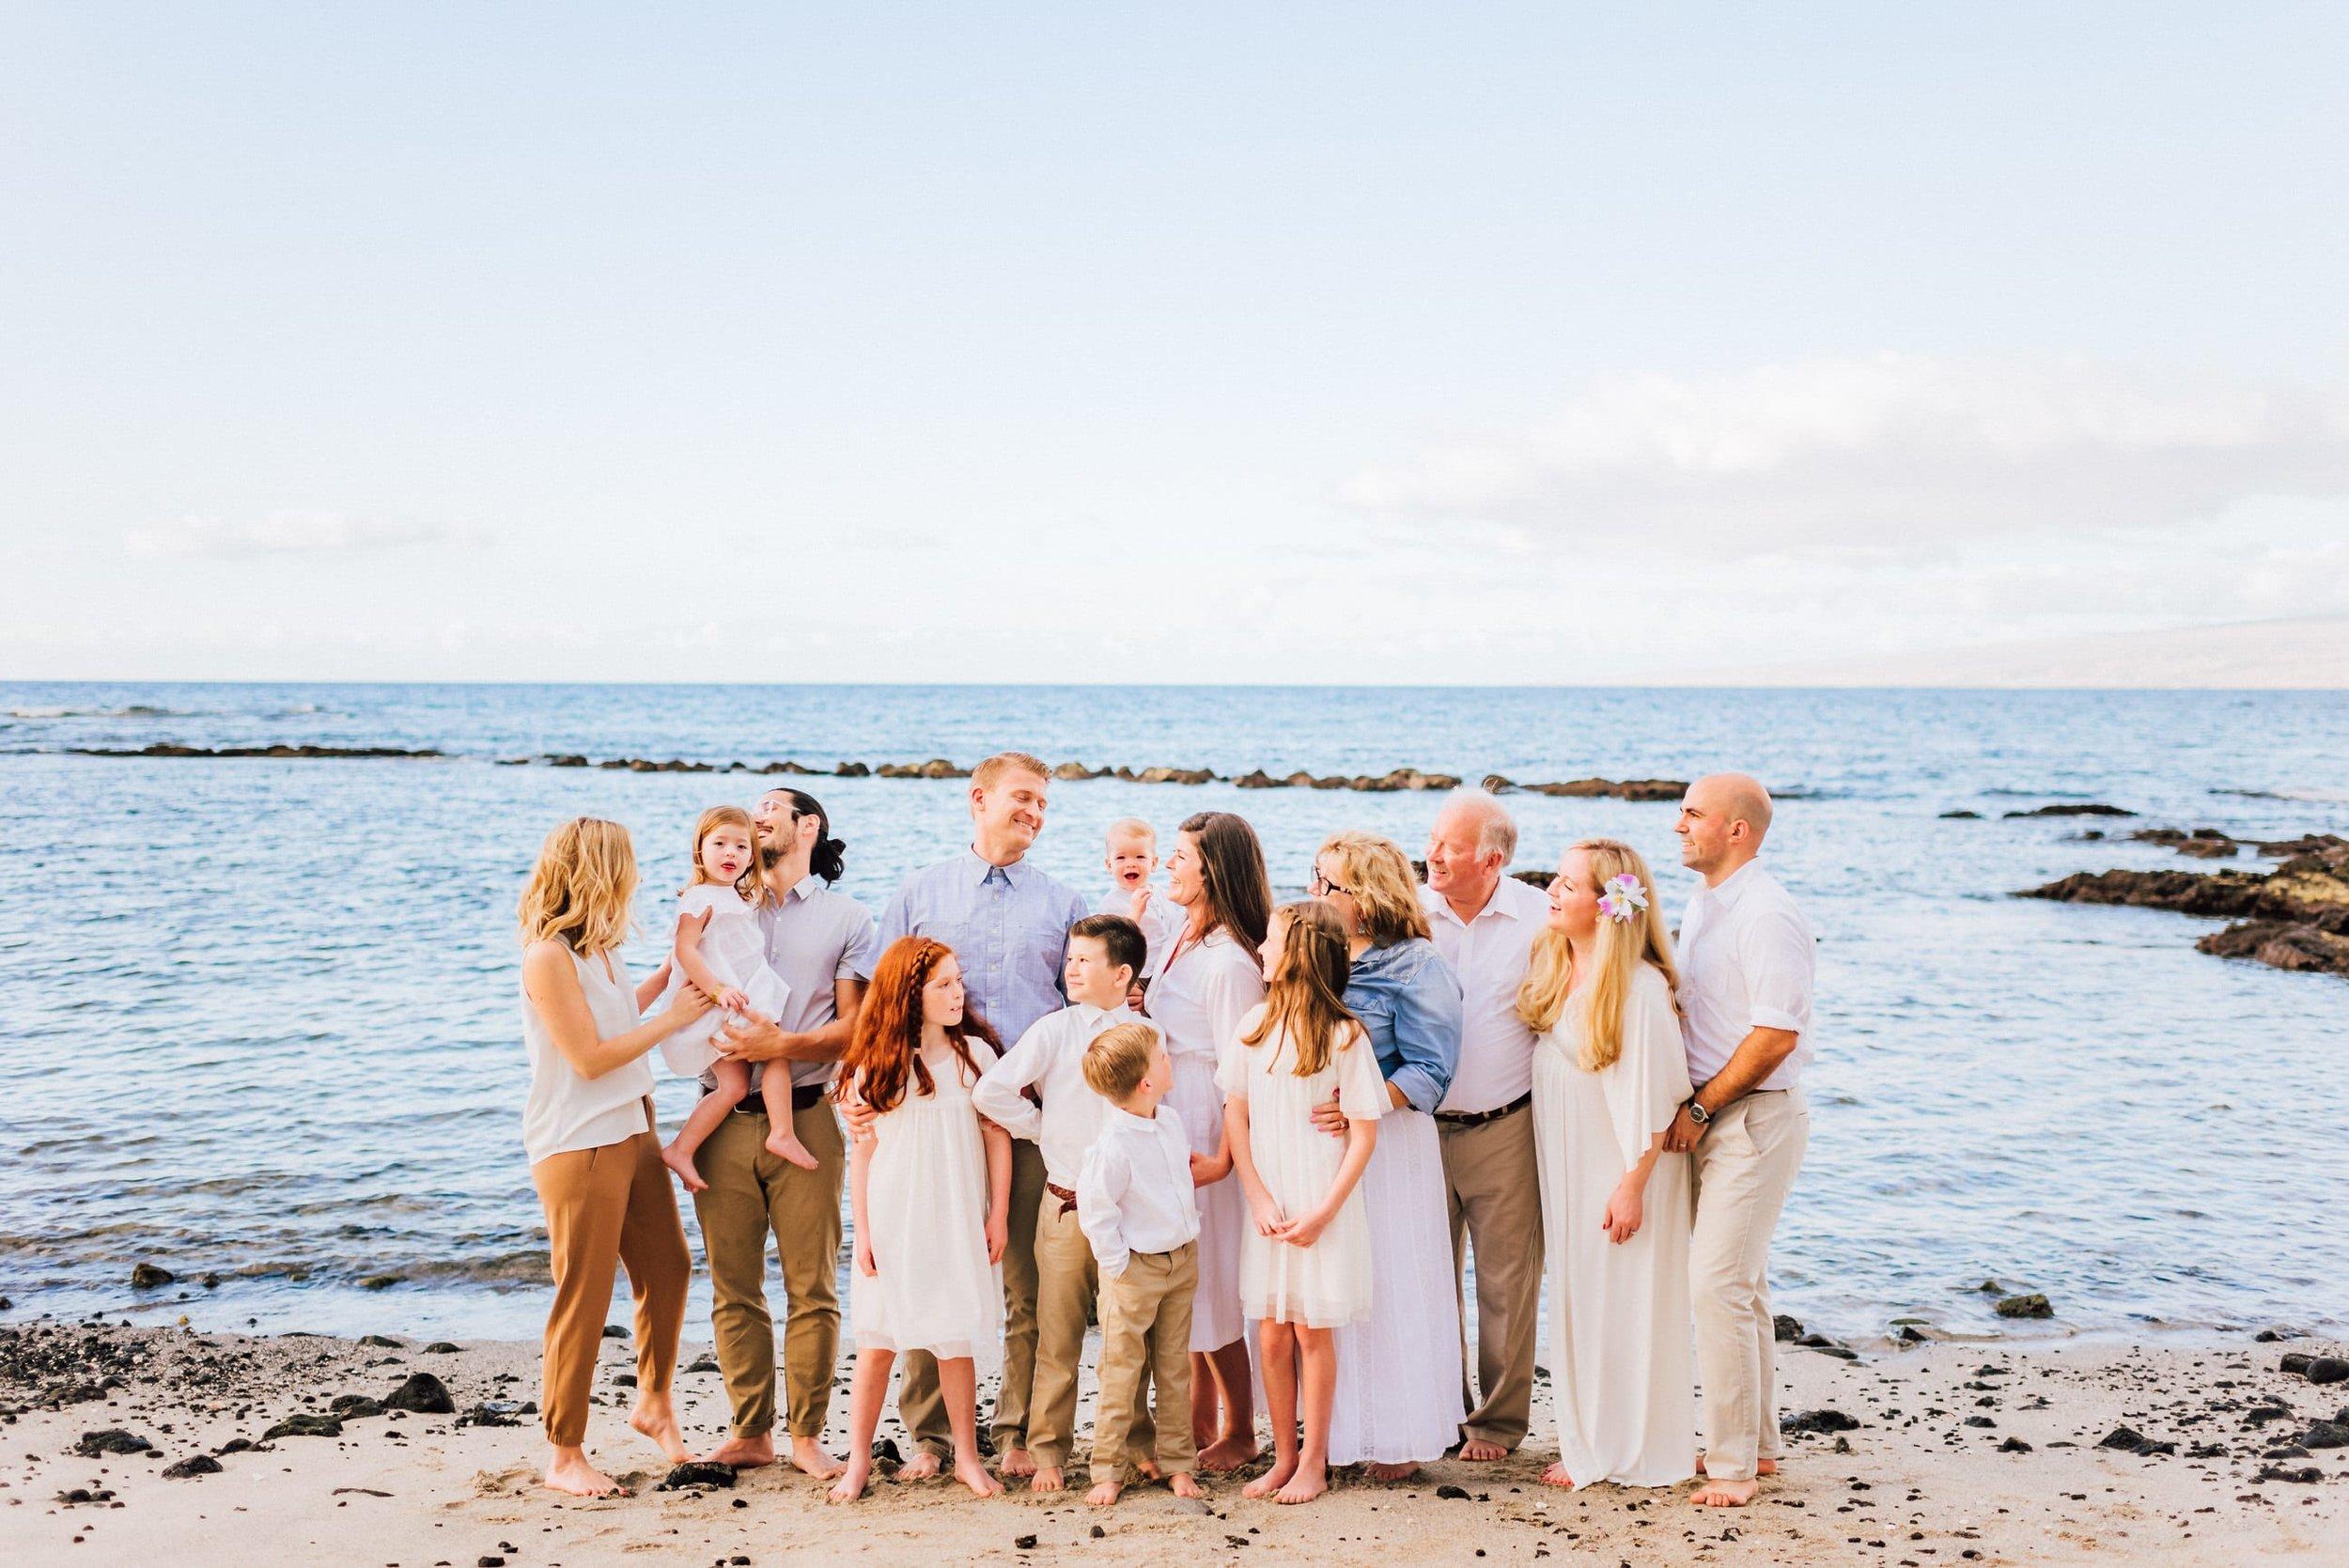 Hawaii-Family-Photographer-Waikoloa-Fairmont-Hualalai-Mauna-Kea-2.jpg